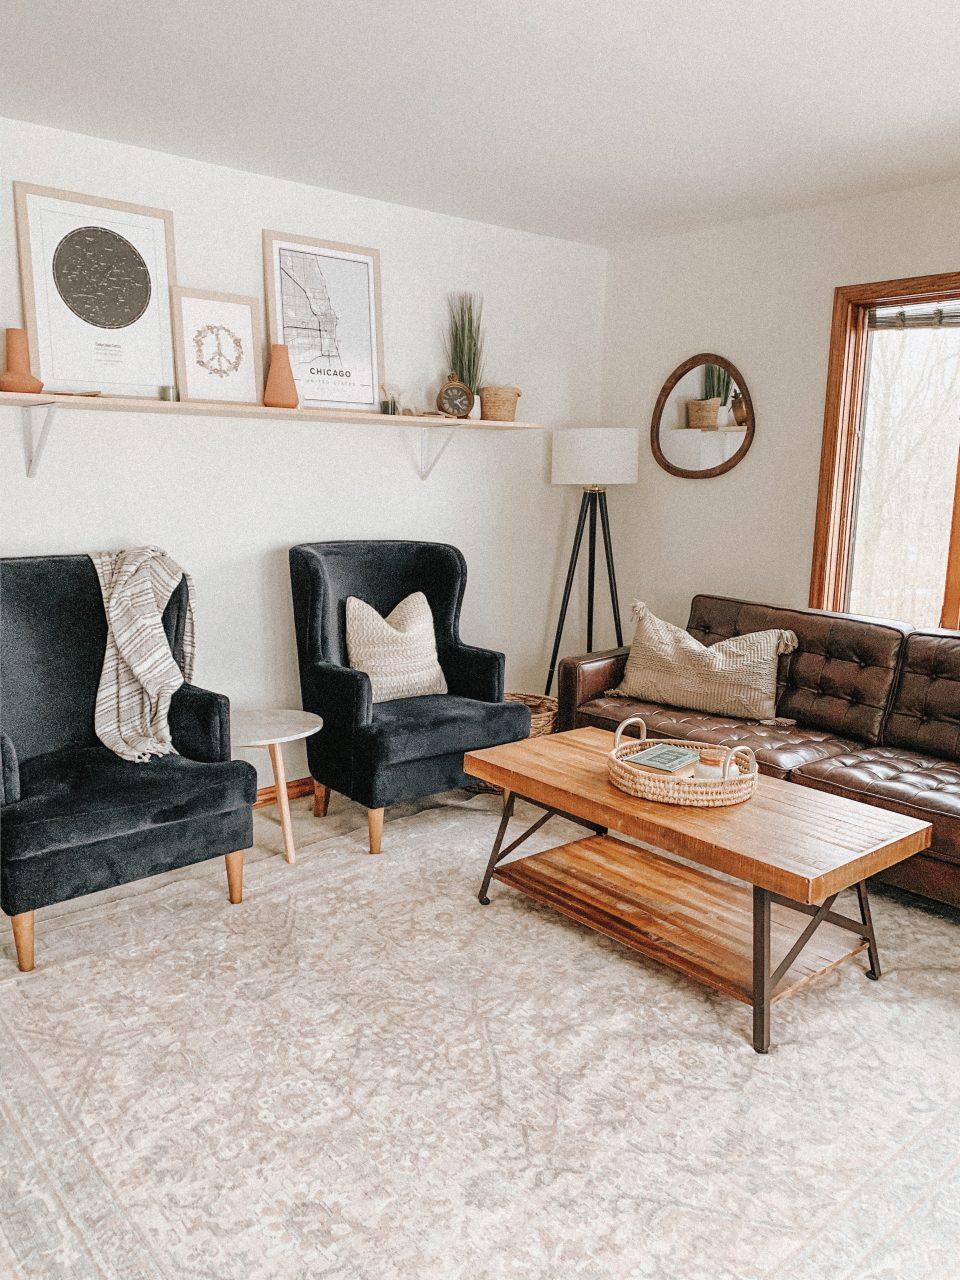 Using storage for home decor